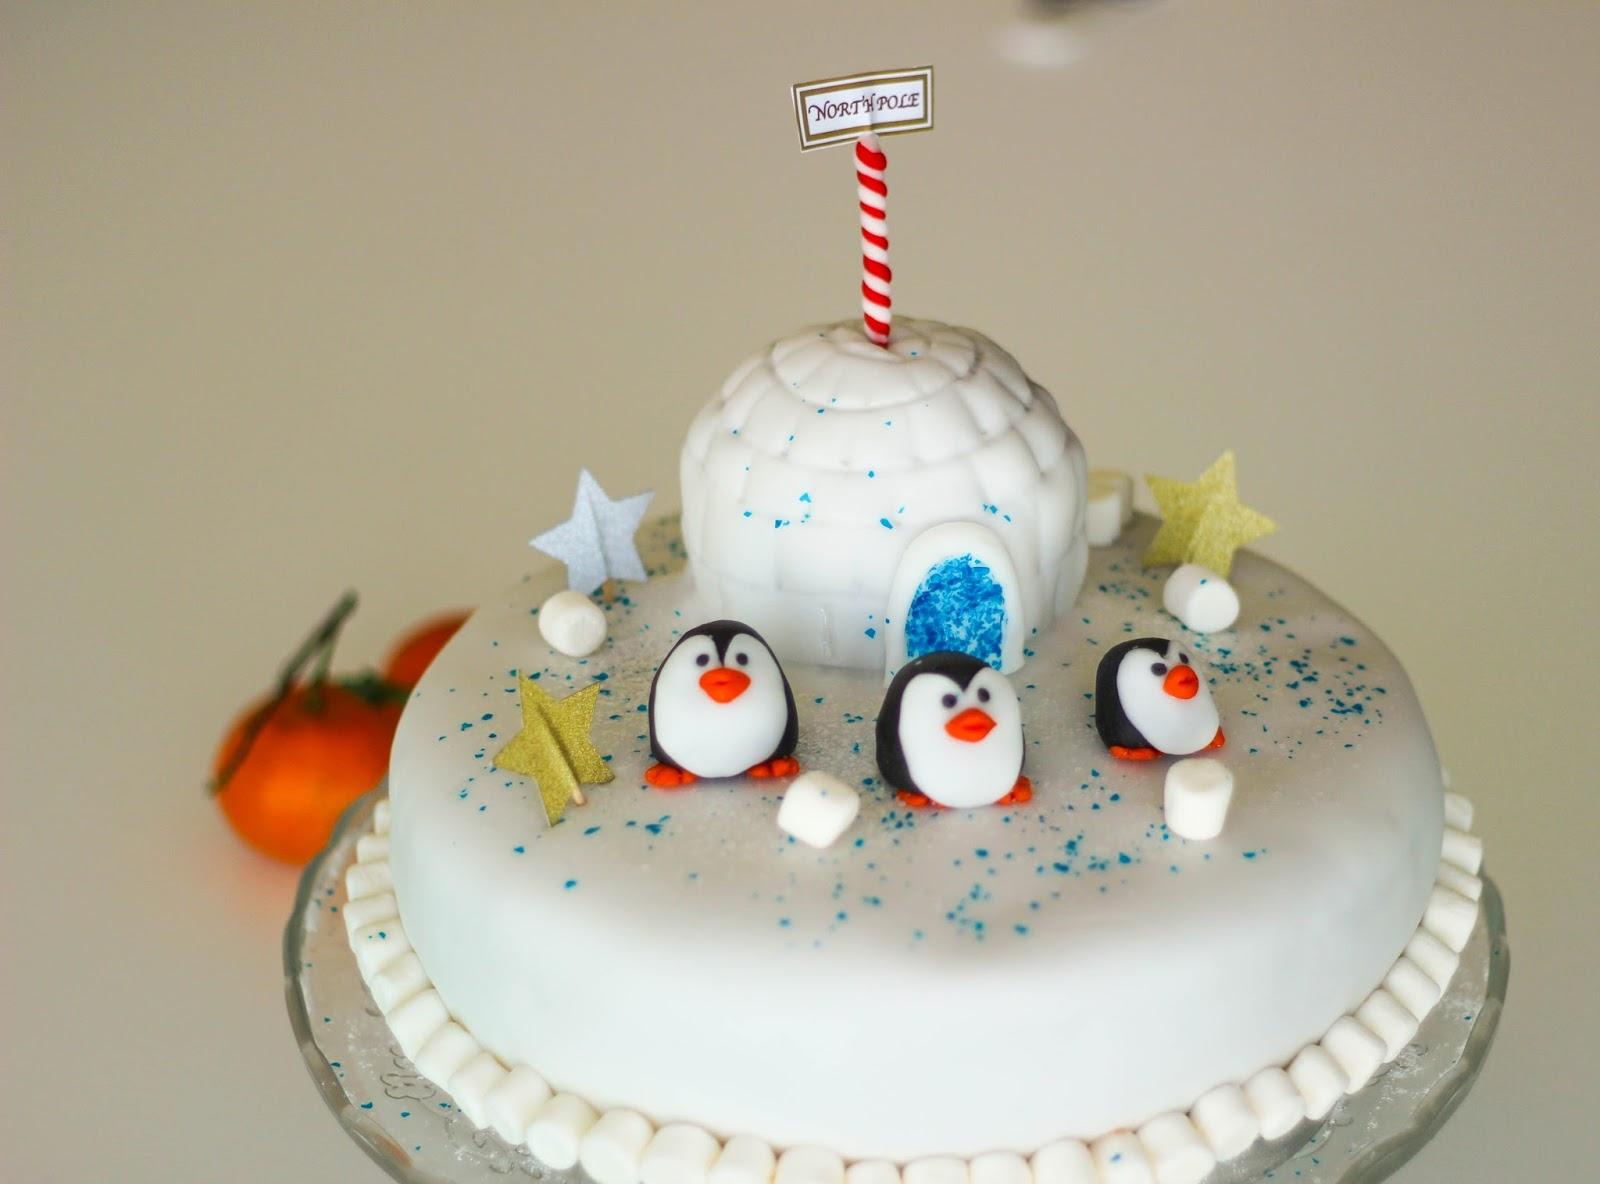 THEMED BIRTHDAY CAKES RIZZORIZZO